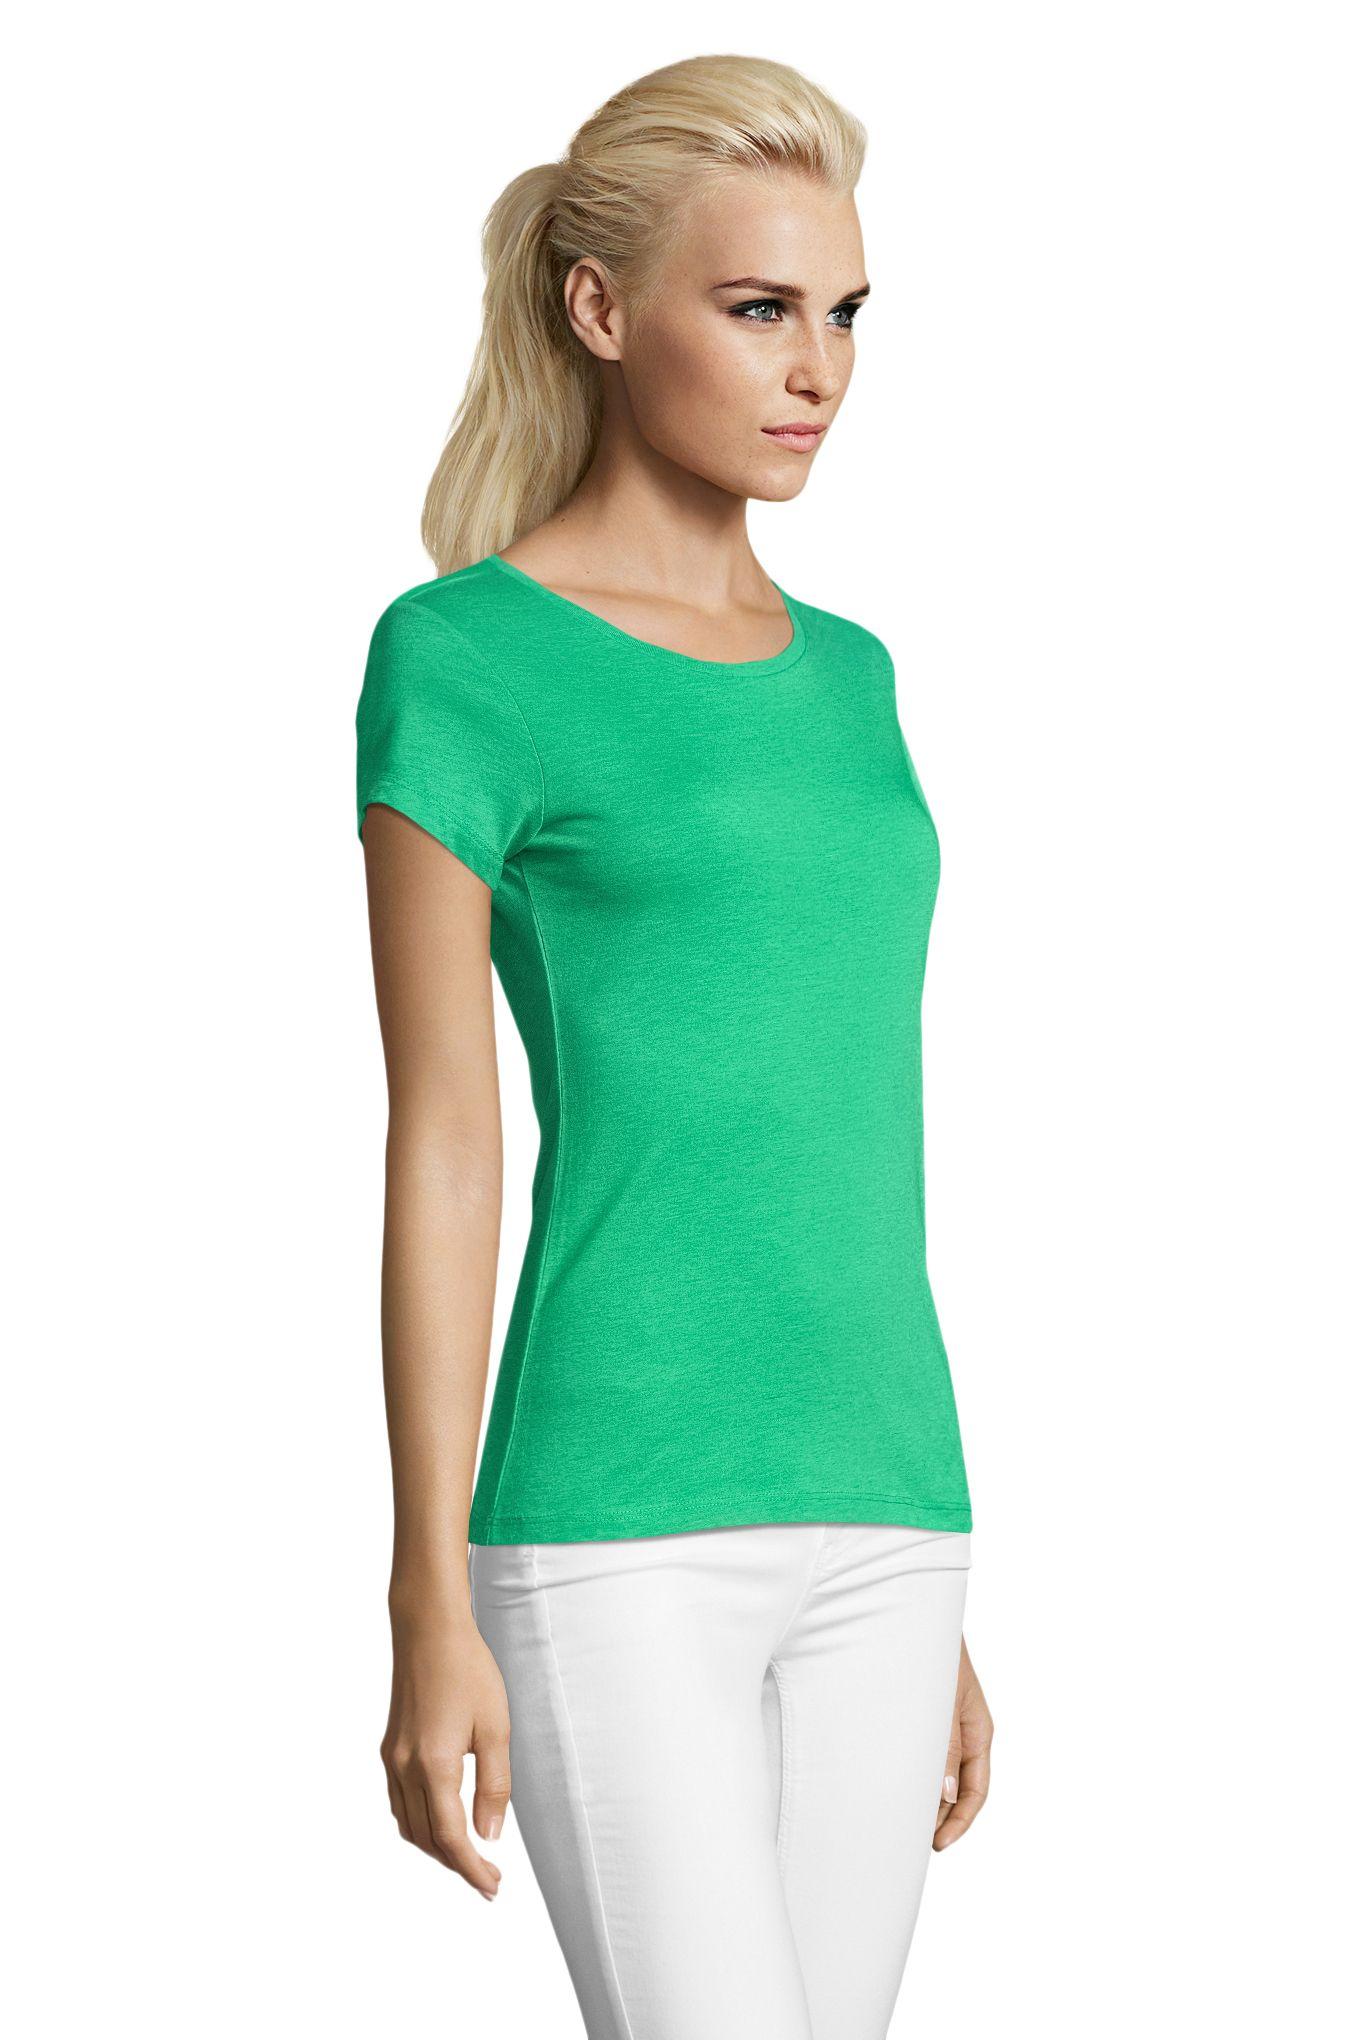 262 - Heather green